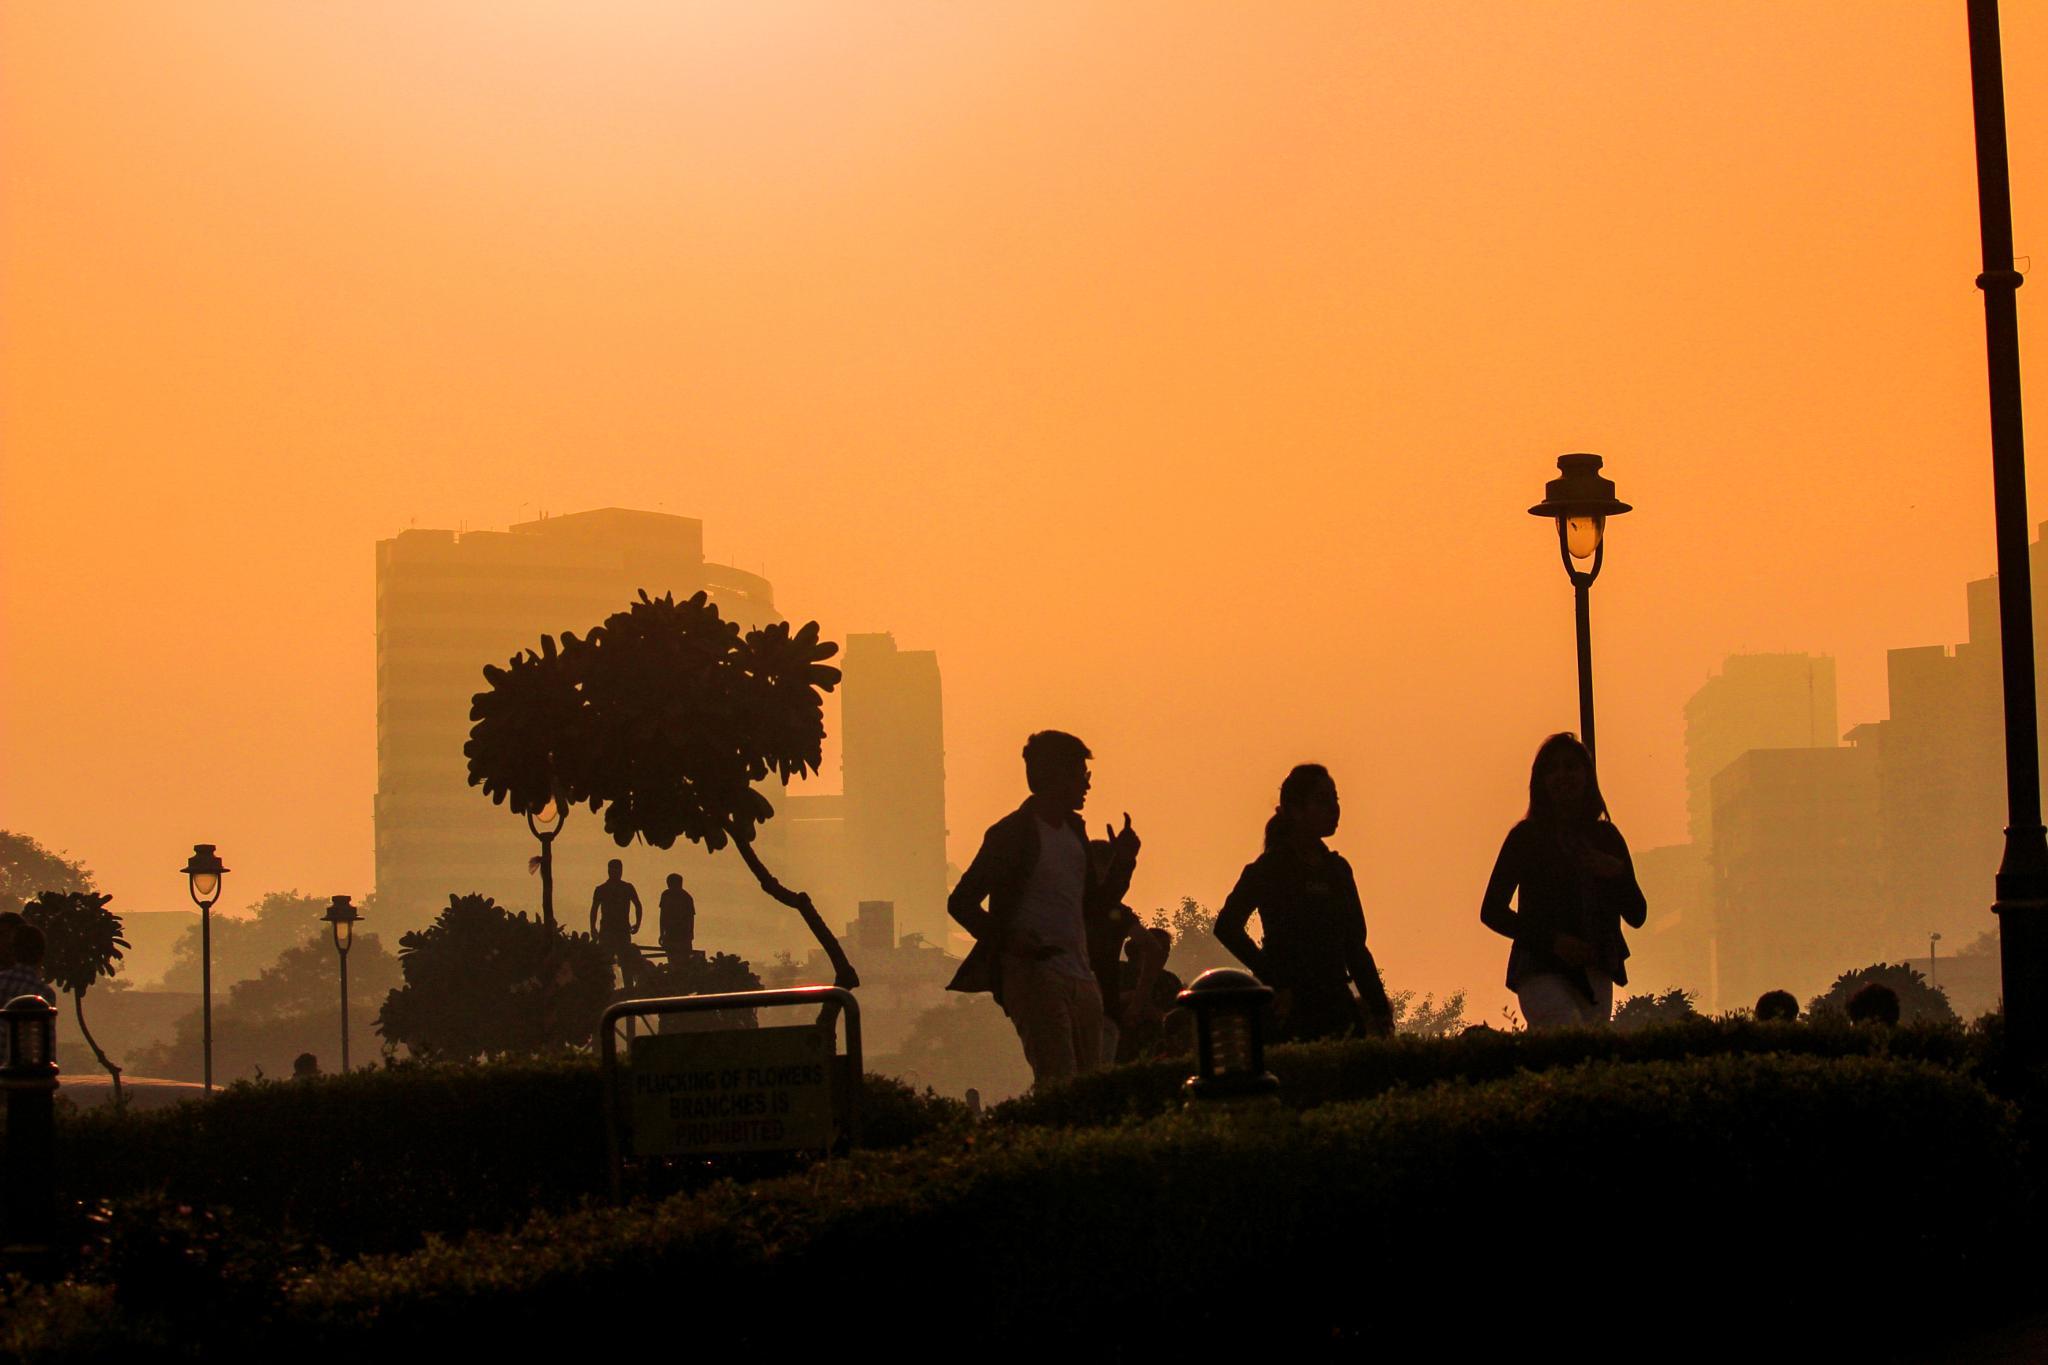 Morning Street by Nikhil Mace